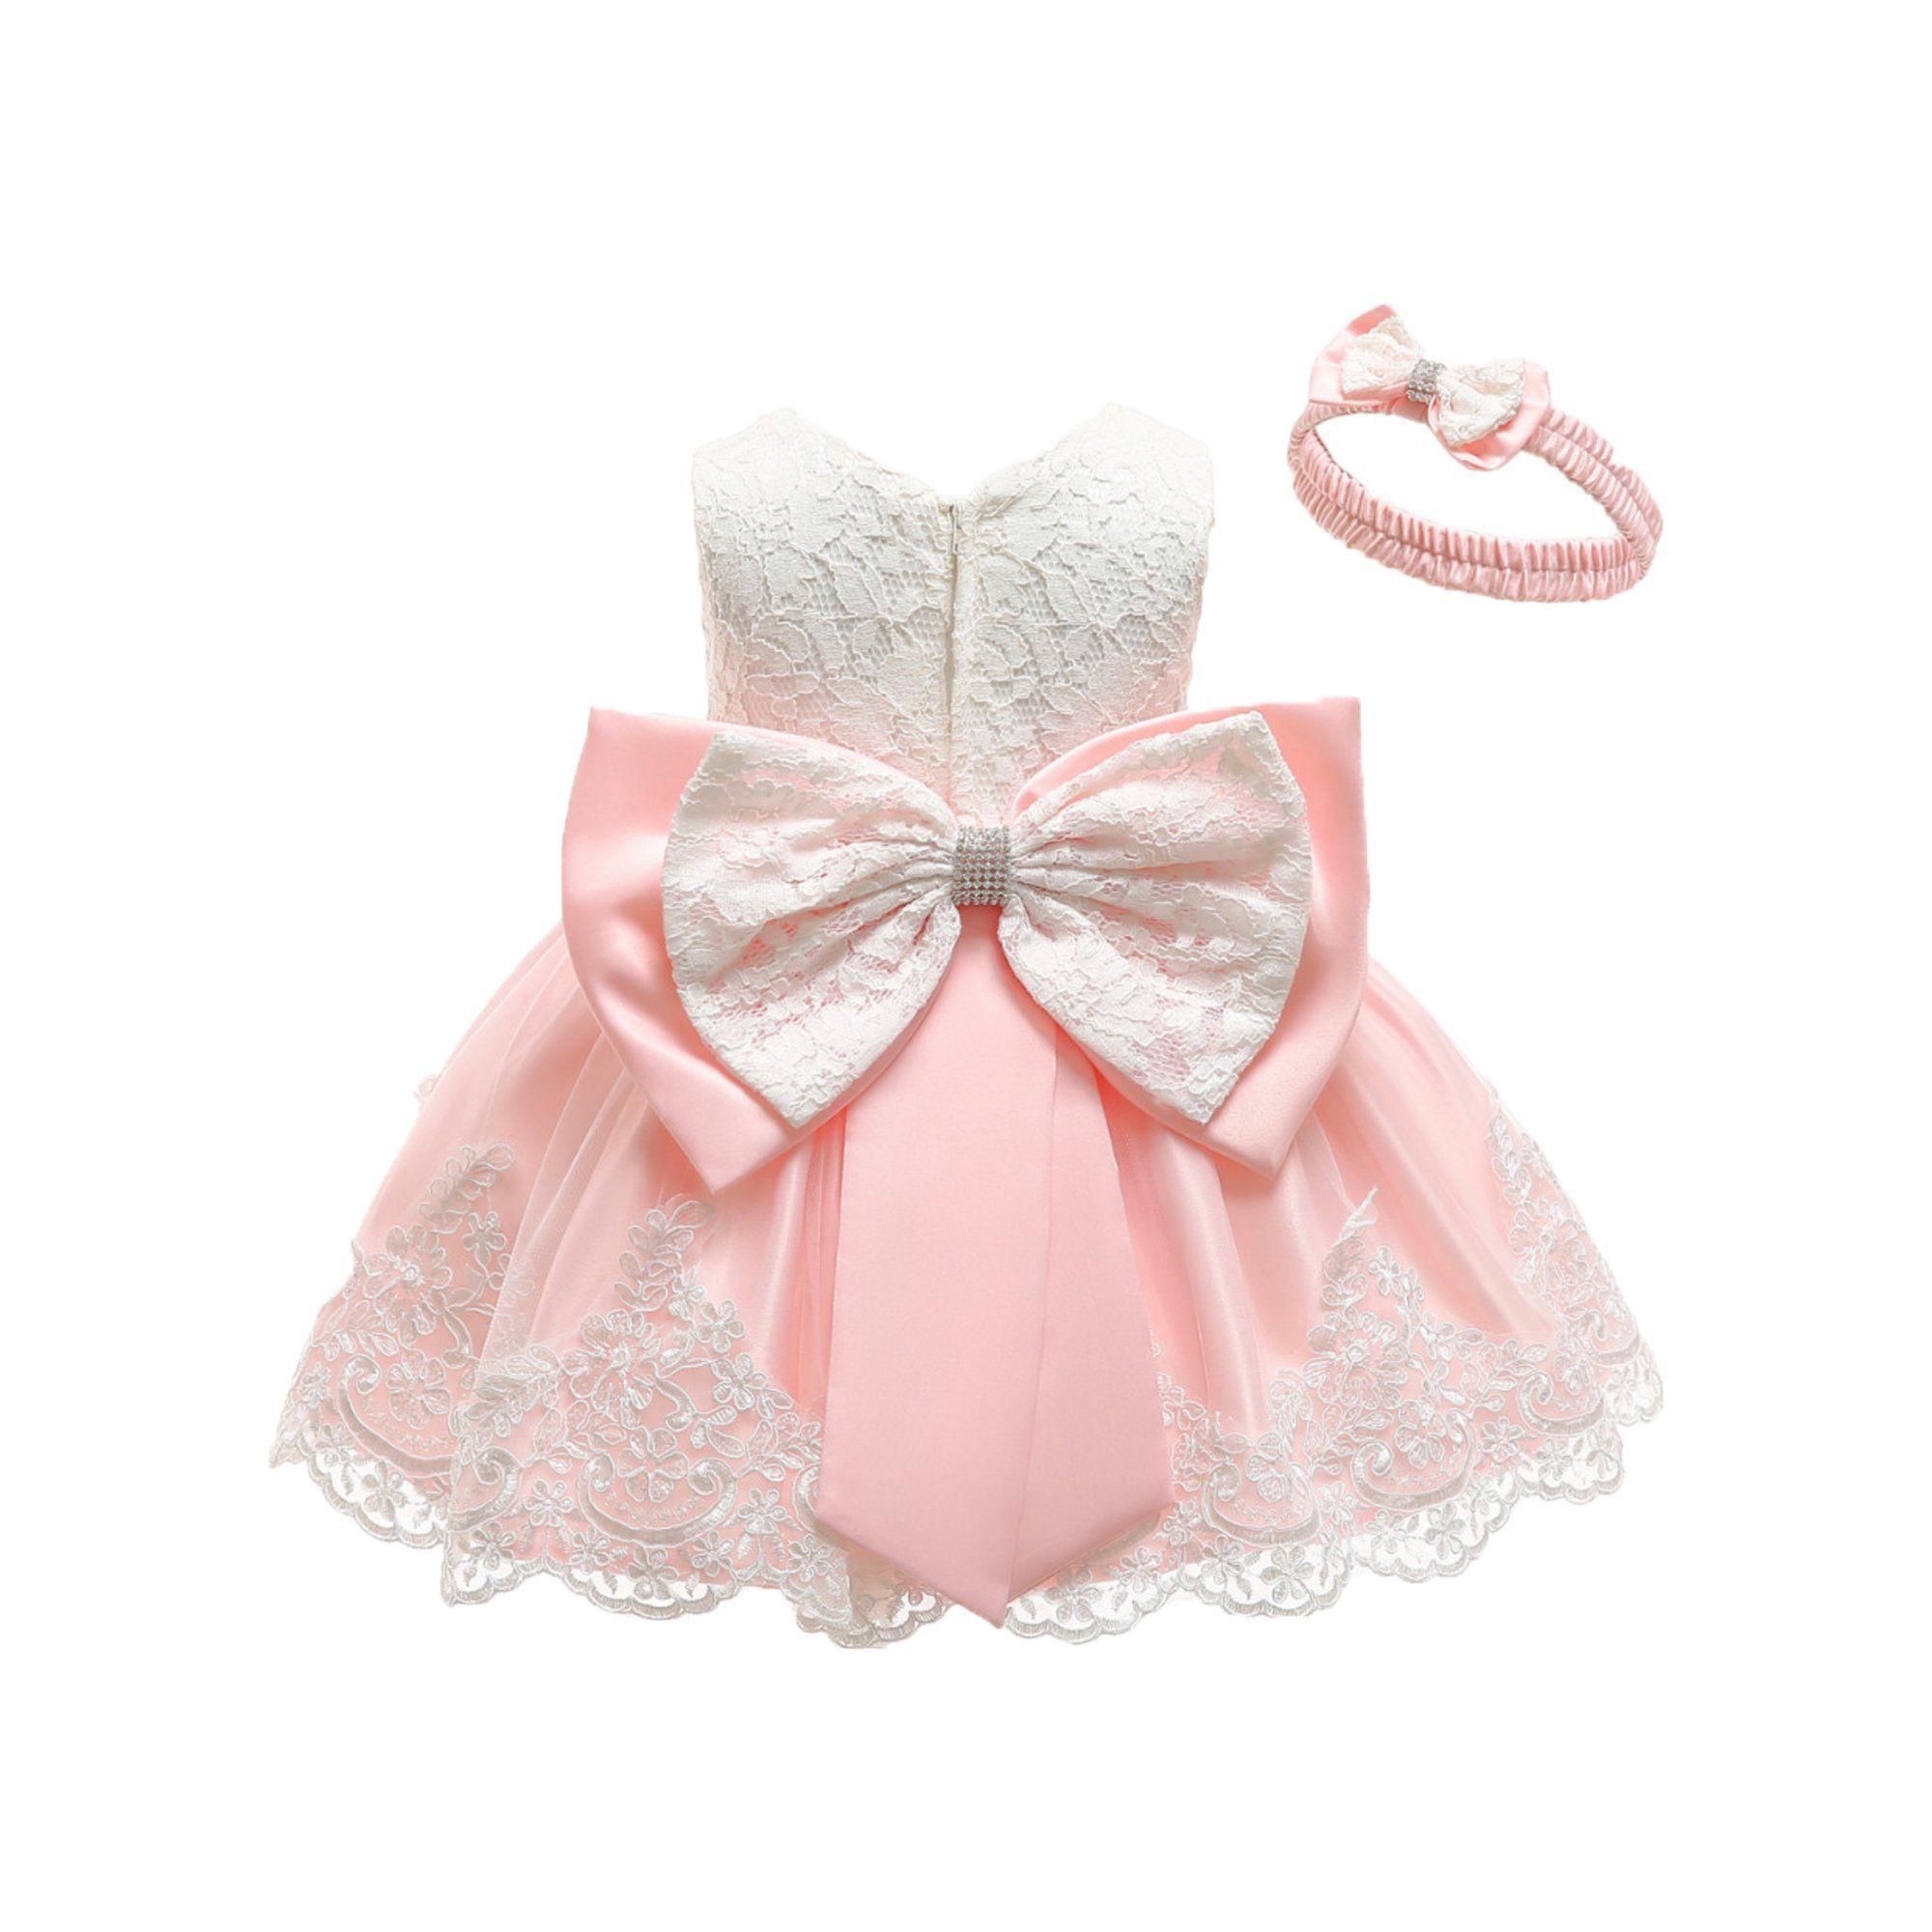 Gupgi Kids Baby Girl Party Bowknot Tutu Dress Pageant Wedding Princess Christening Walmart Com Wa In 2021 Girls Baptism Dress Baby Girl Dress Girl Princess Dress [ 2000 x 2000 Pixel ]